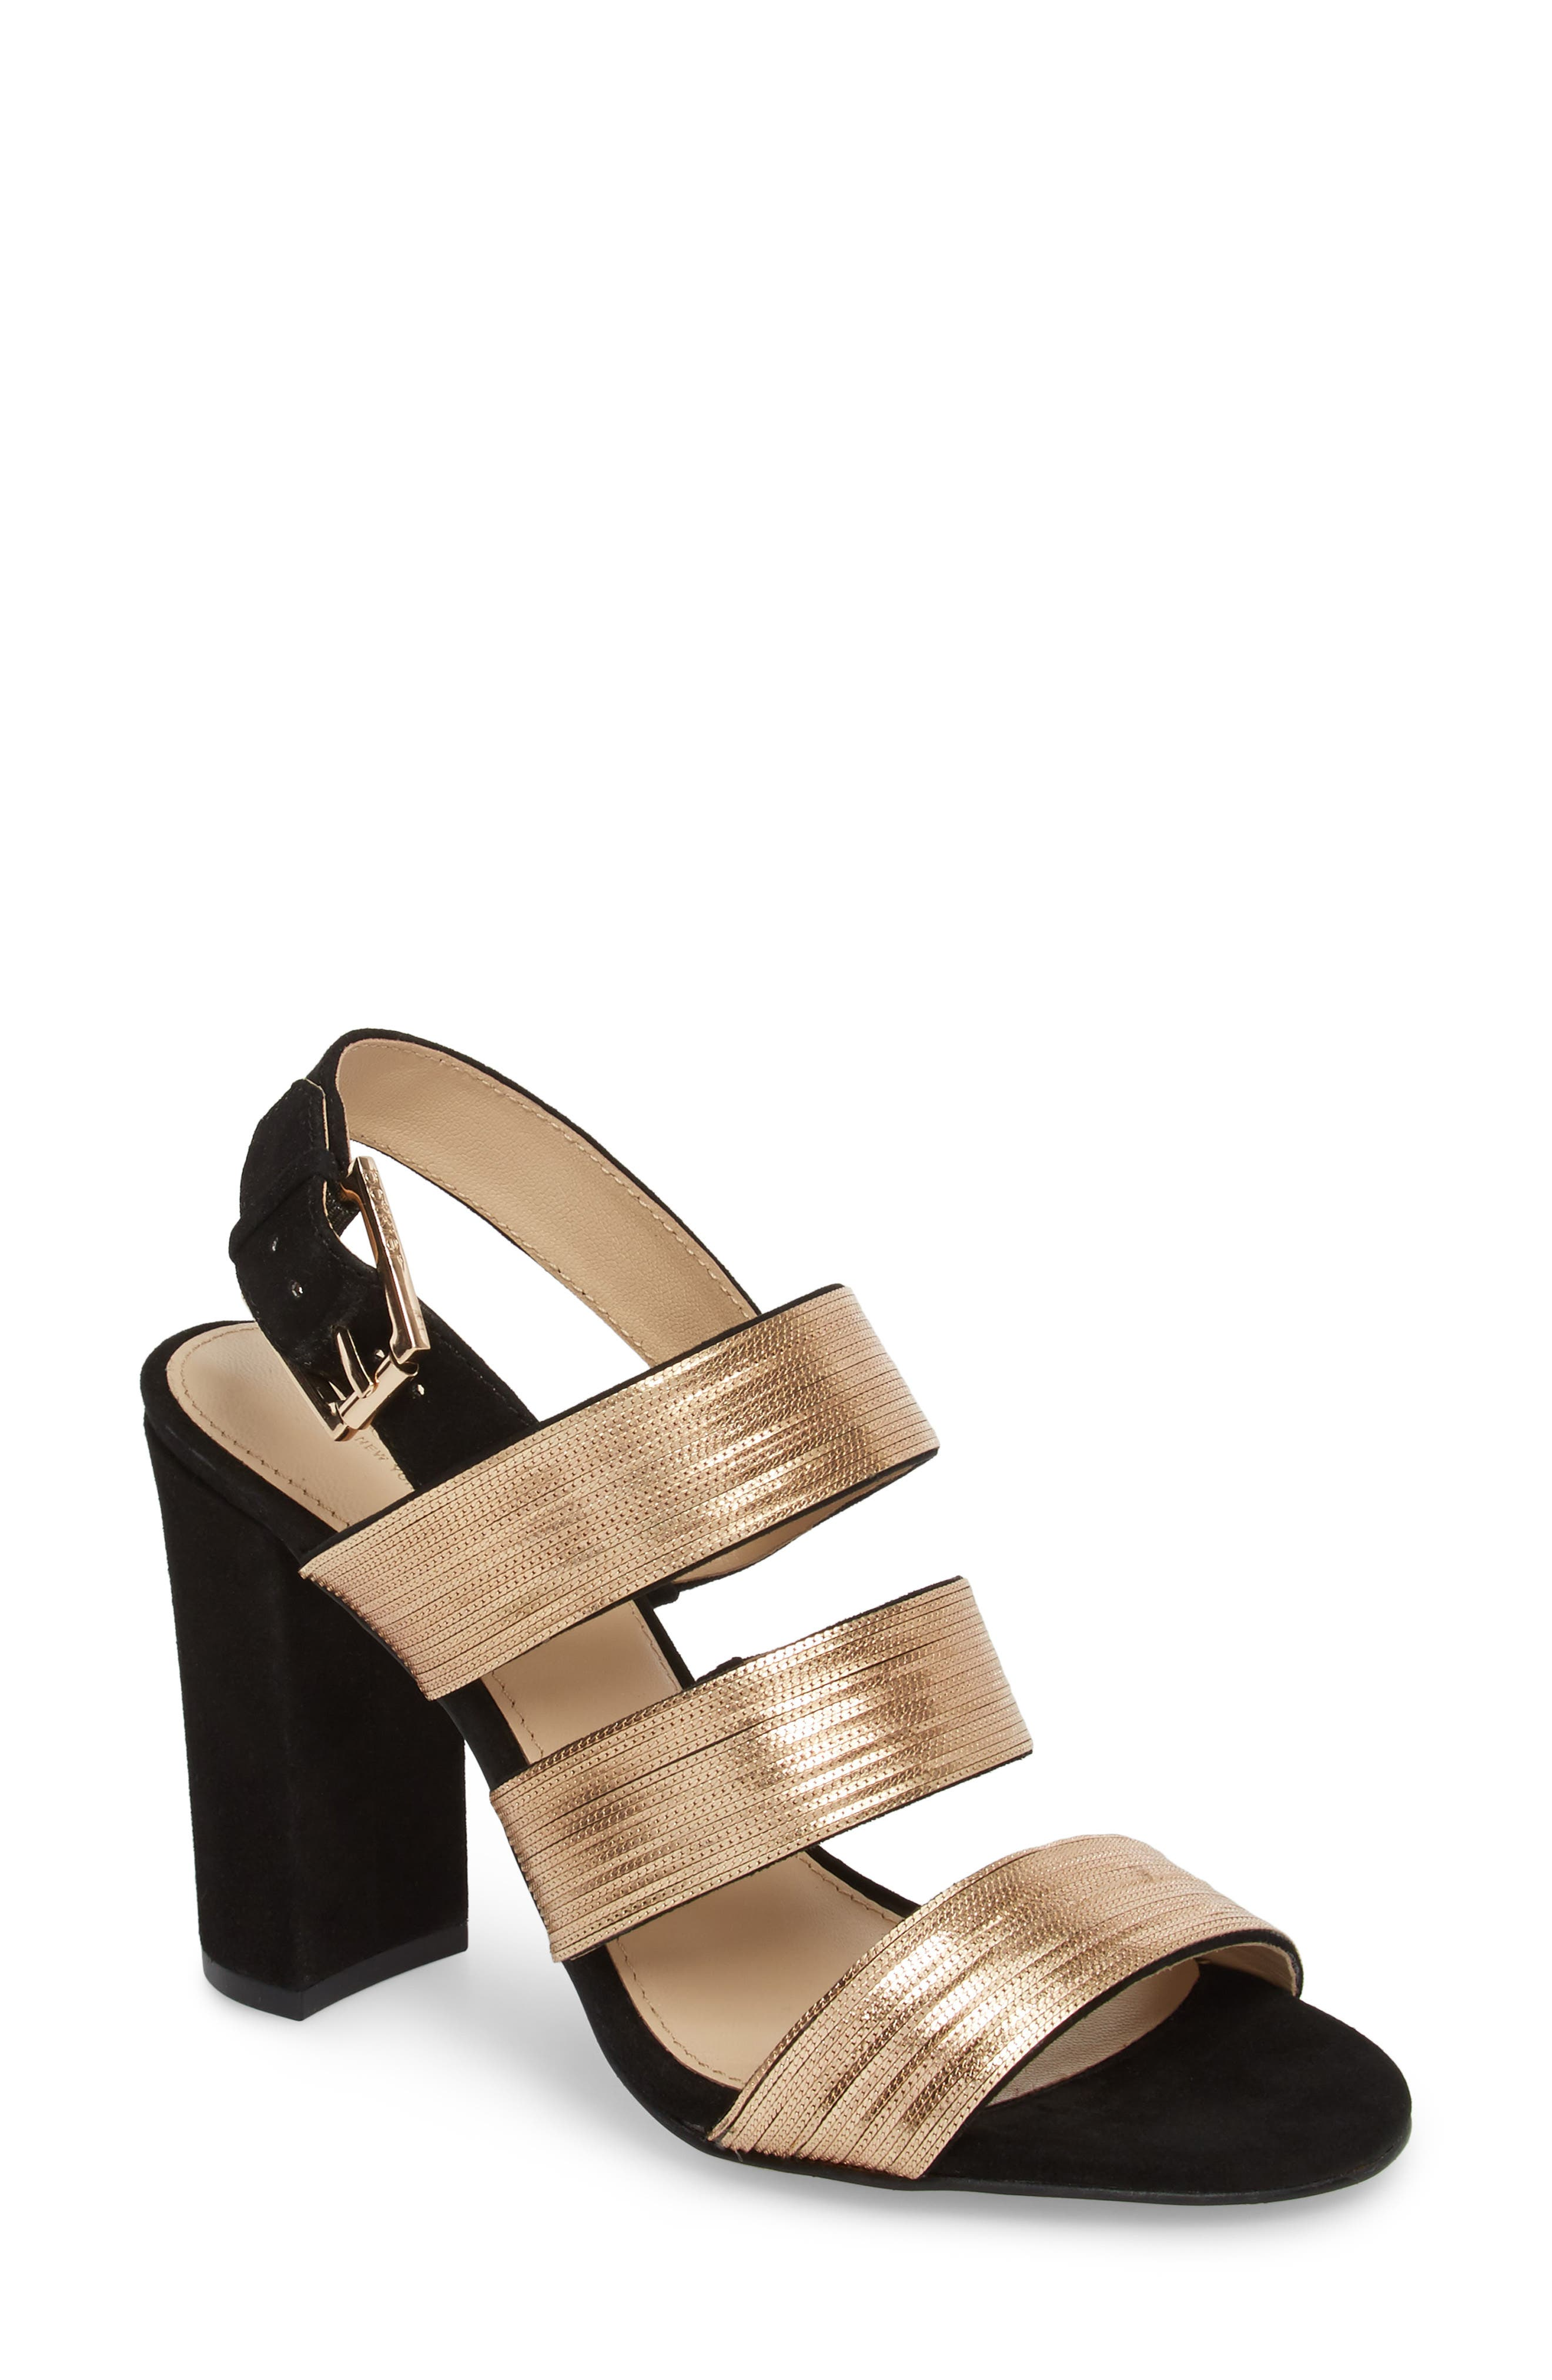 Genesa Chain Slingback Sandal,                             Main thumbnail 1, color,                             Black/ Gold Suede